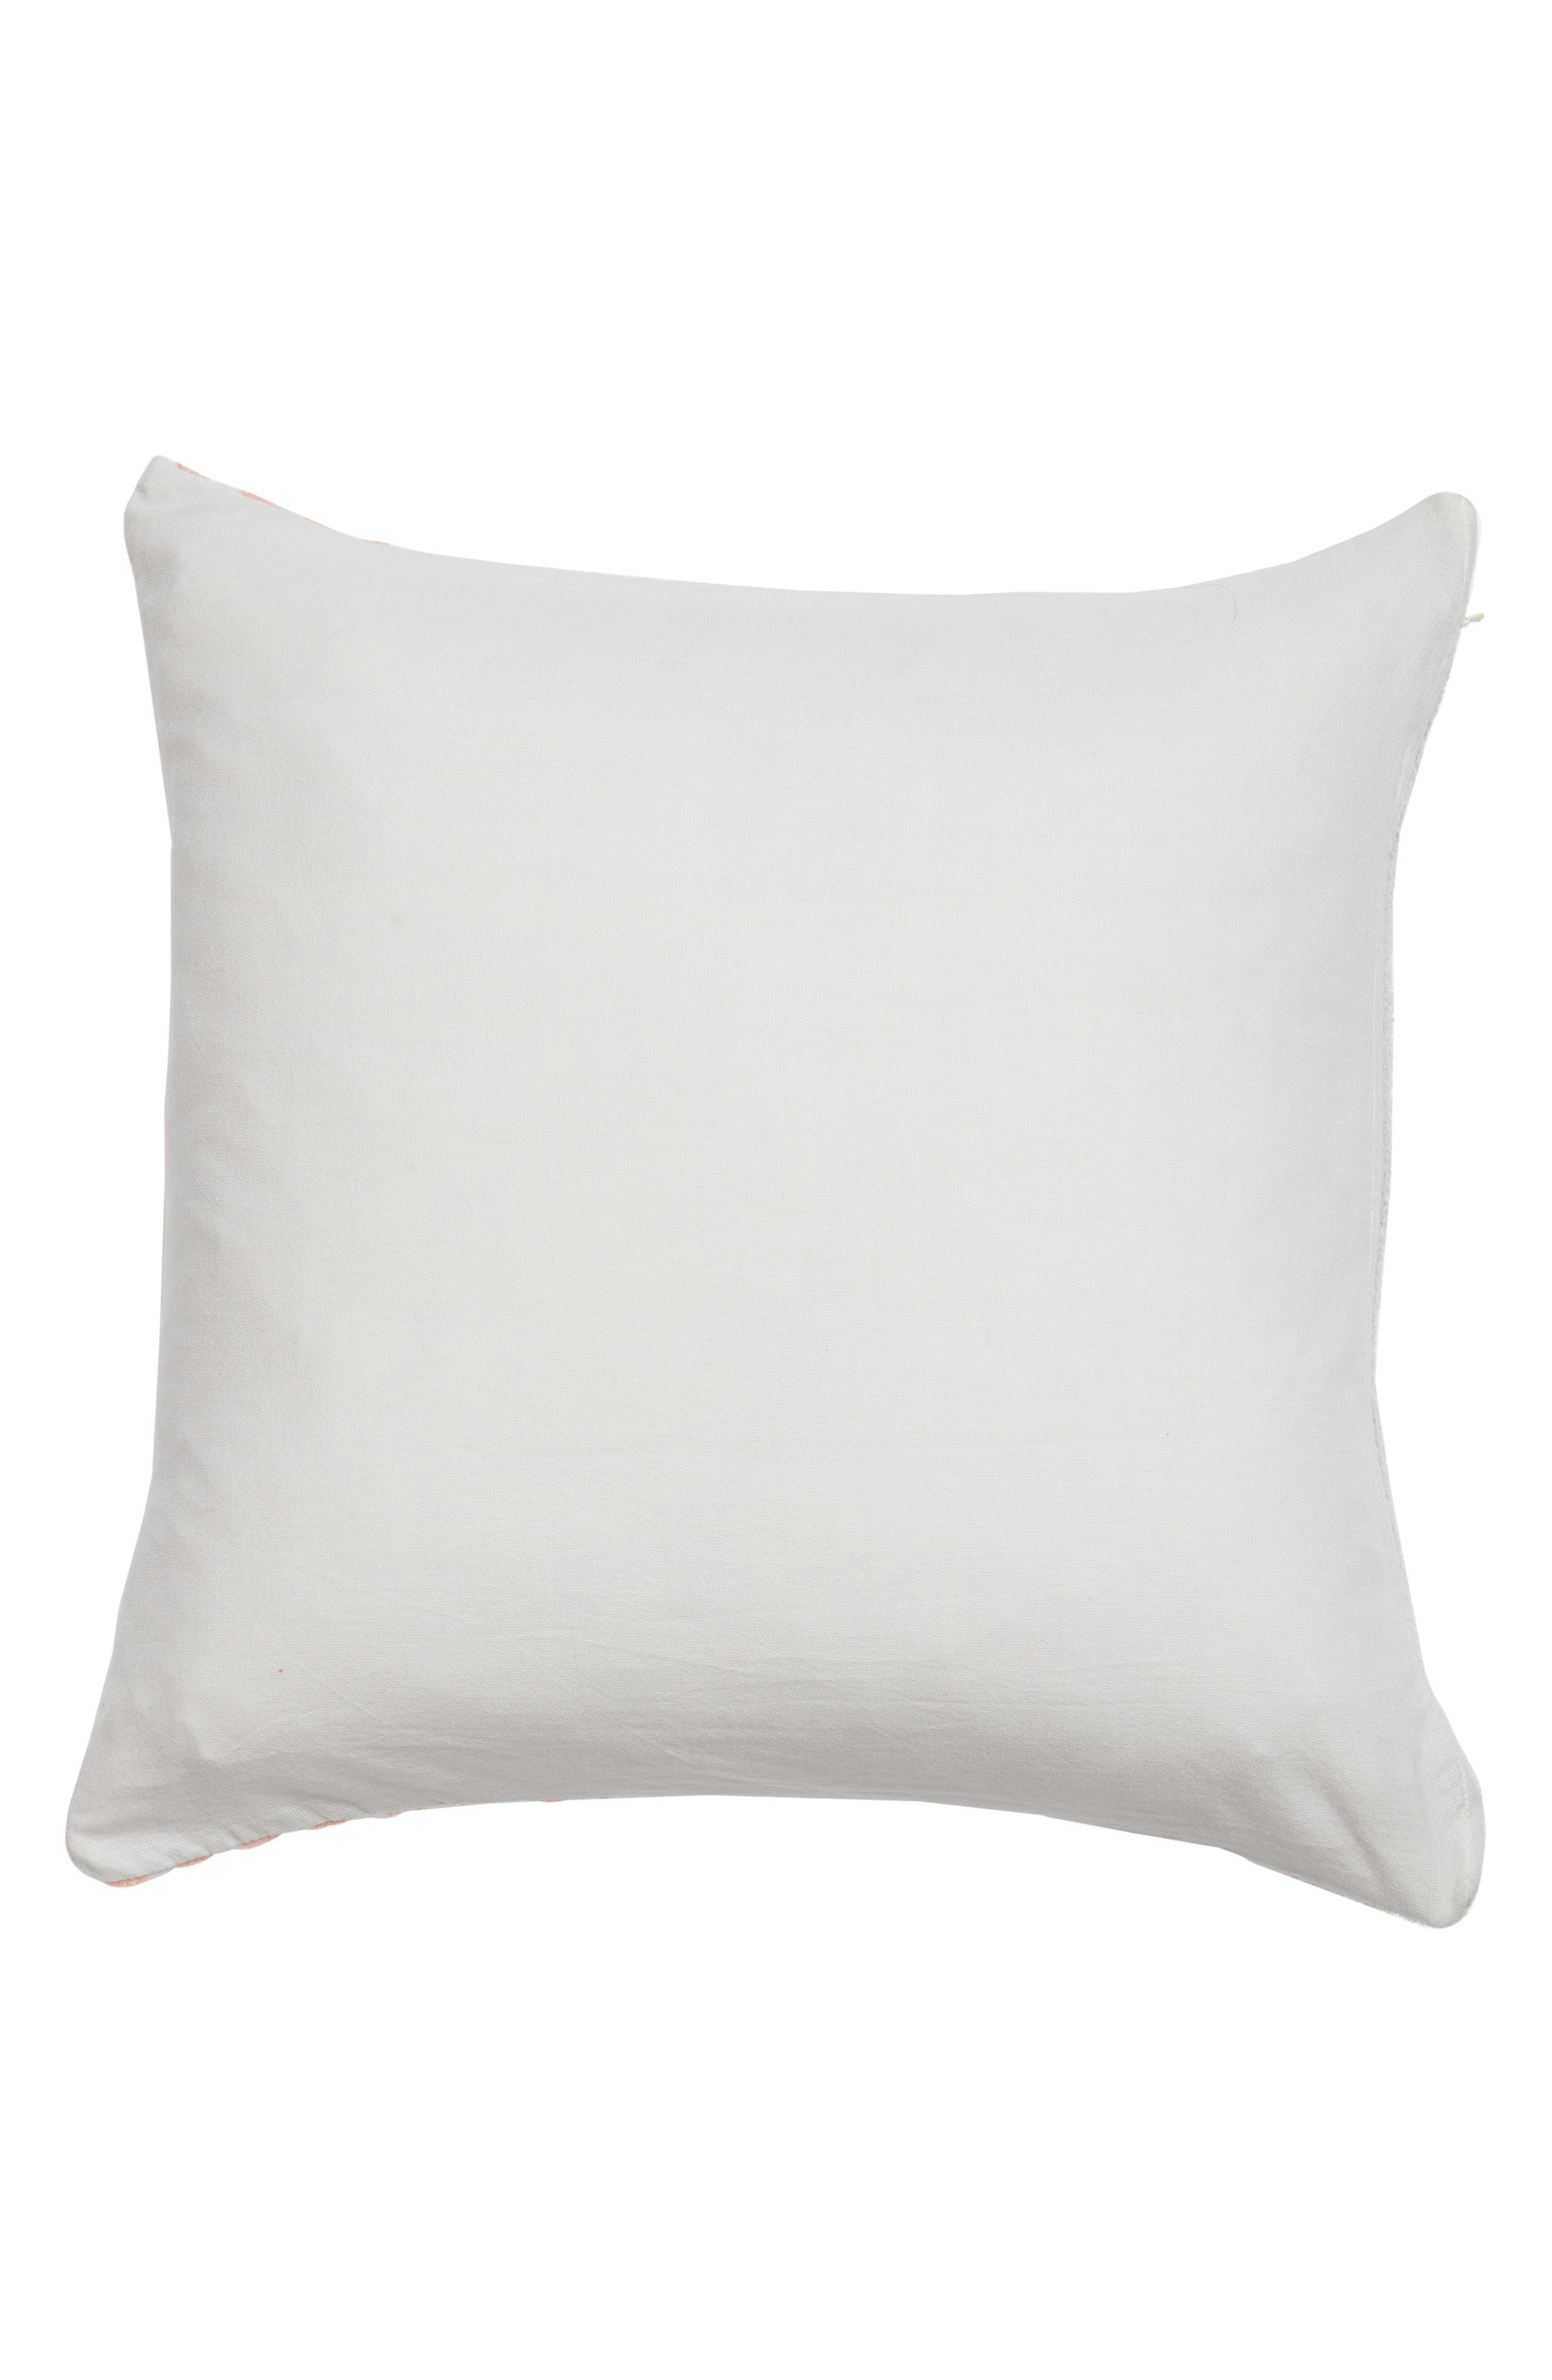 Hammam Stripe Accent Pillow,                             Alternate thumbnail 2, color,                             Grey Vapor